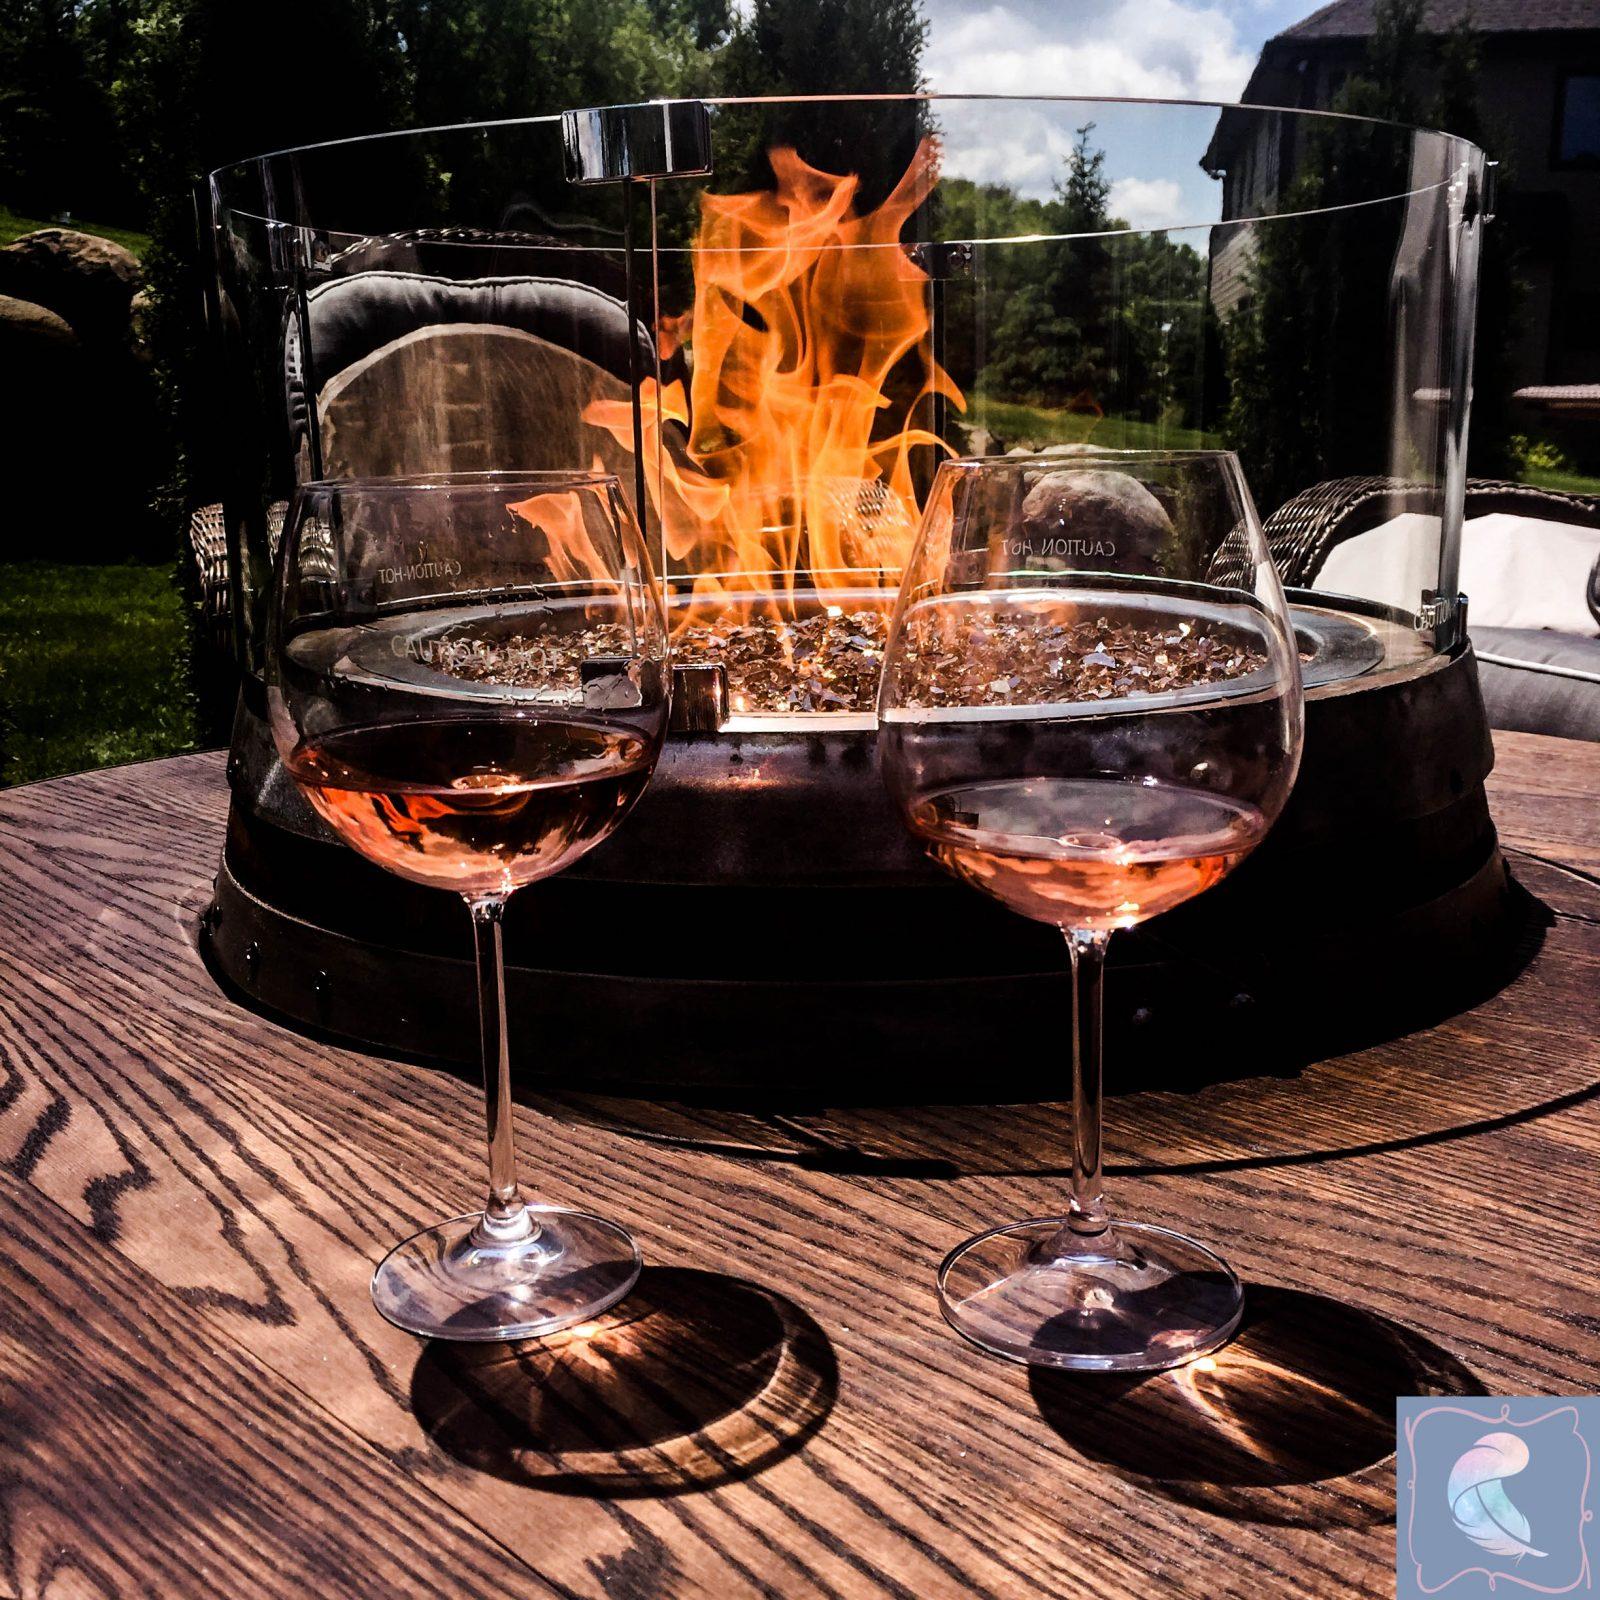 Propane Wine Barrel Fire Pit Lauftylife Com Wine